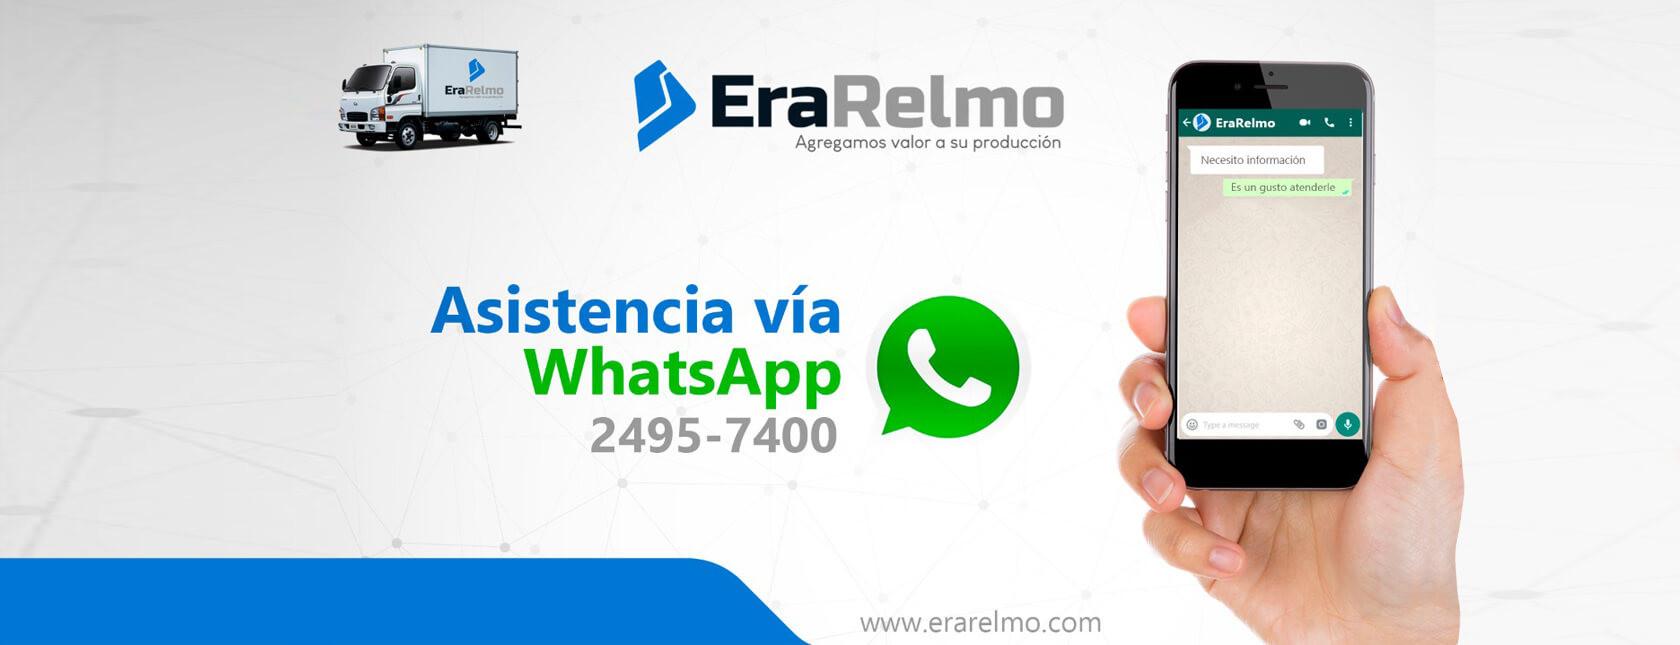 Banner-web-EraRelmo 2 (1).jpg